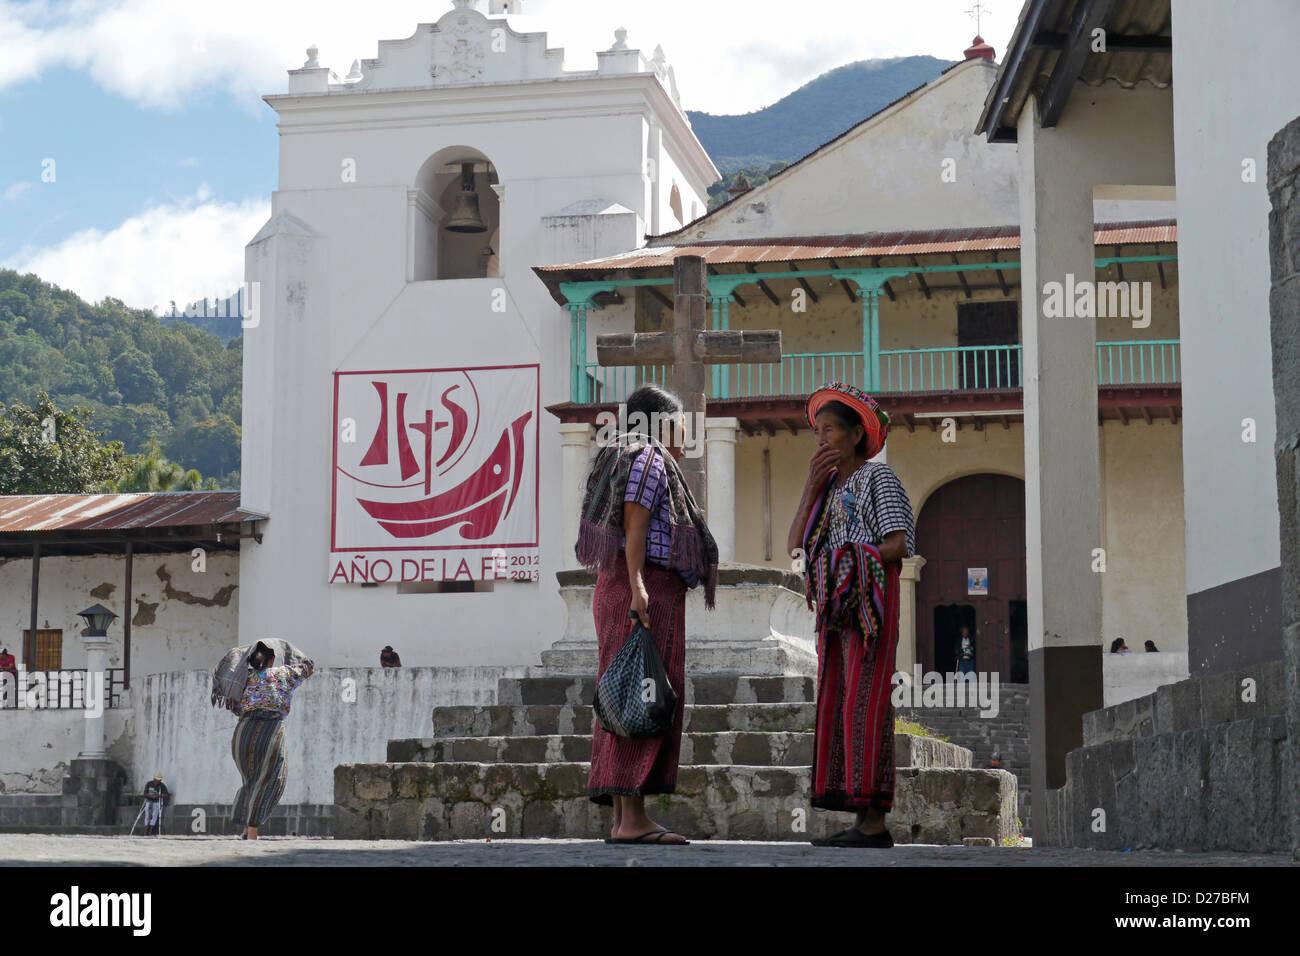 The catholic church, Santiago de Atitlan. Woman in traditional dress. - Stock Image